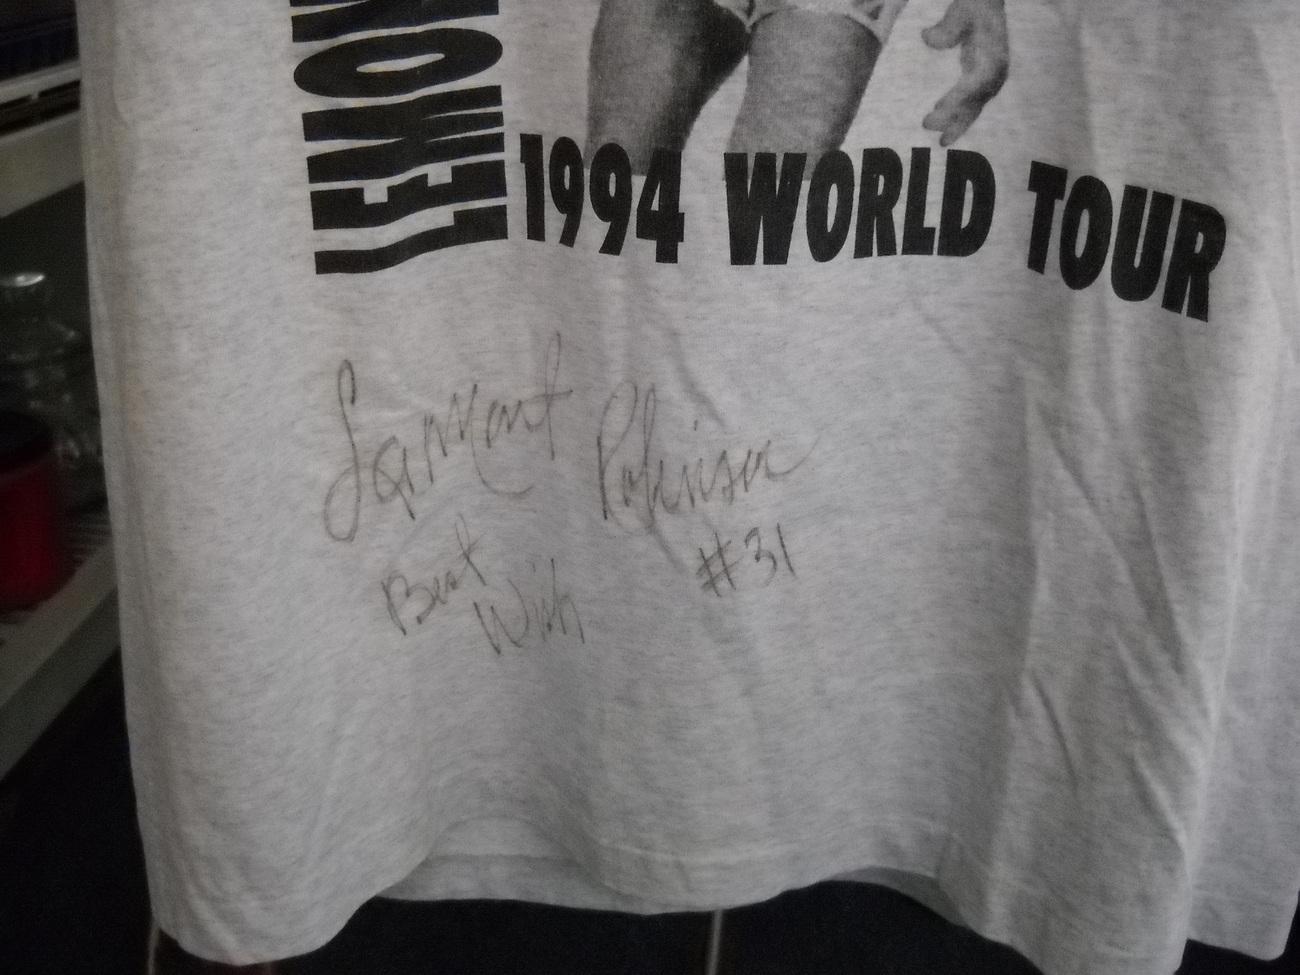 T Shirt Harlem Globetrotter LaMont Robinson XL Autographed Fruit Of the Loom